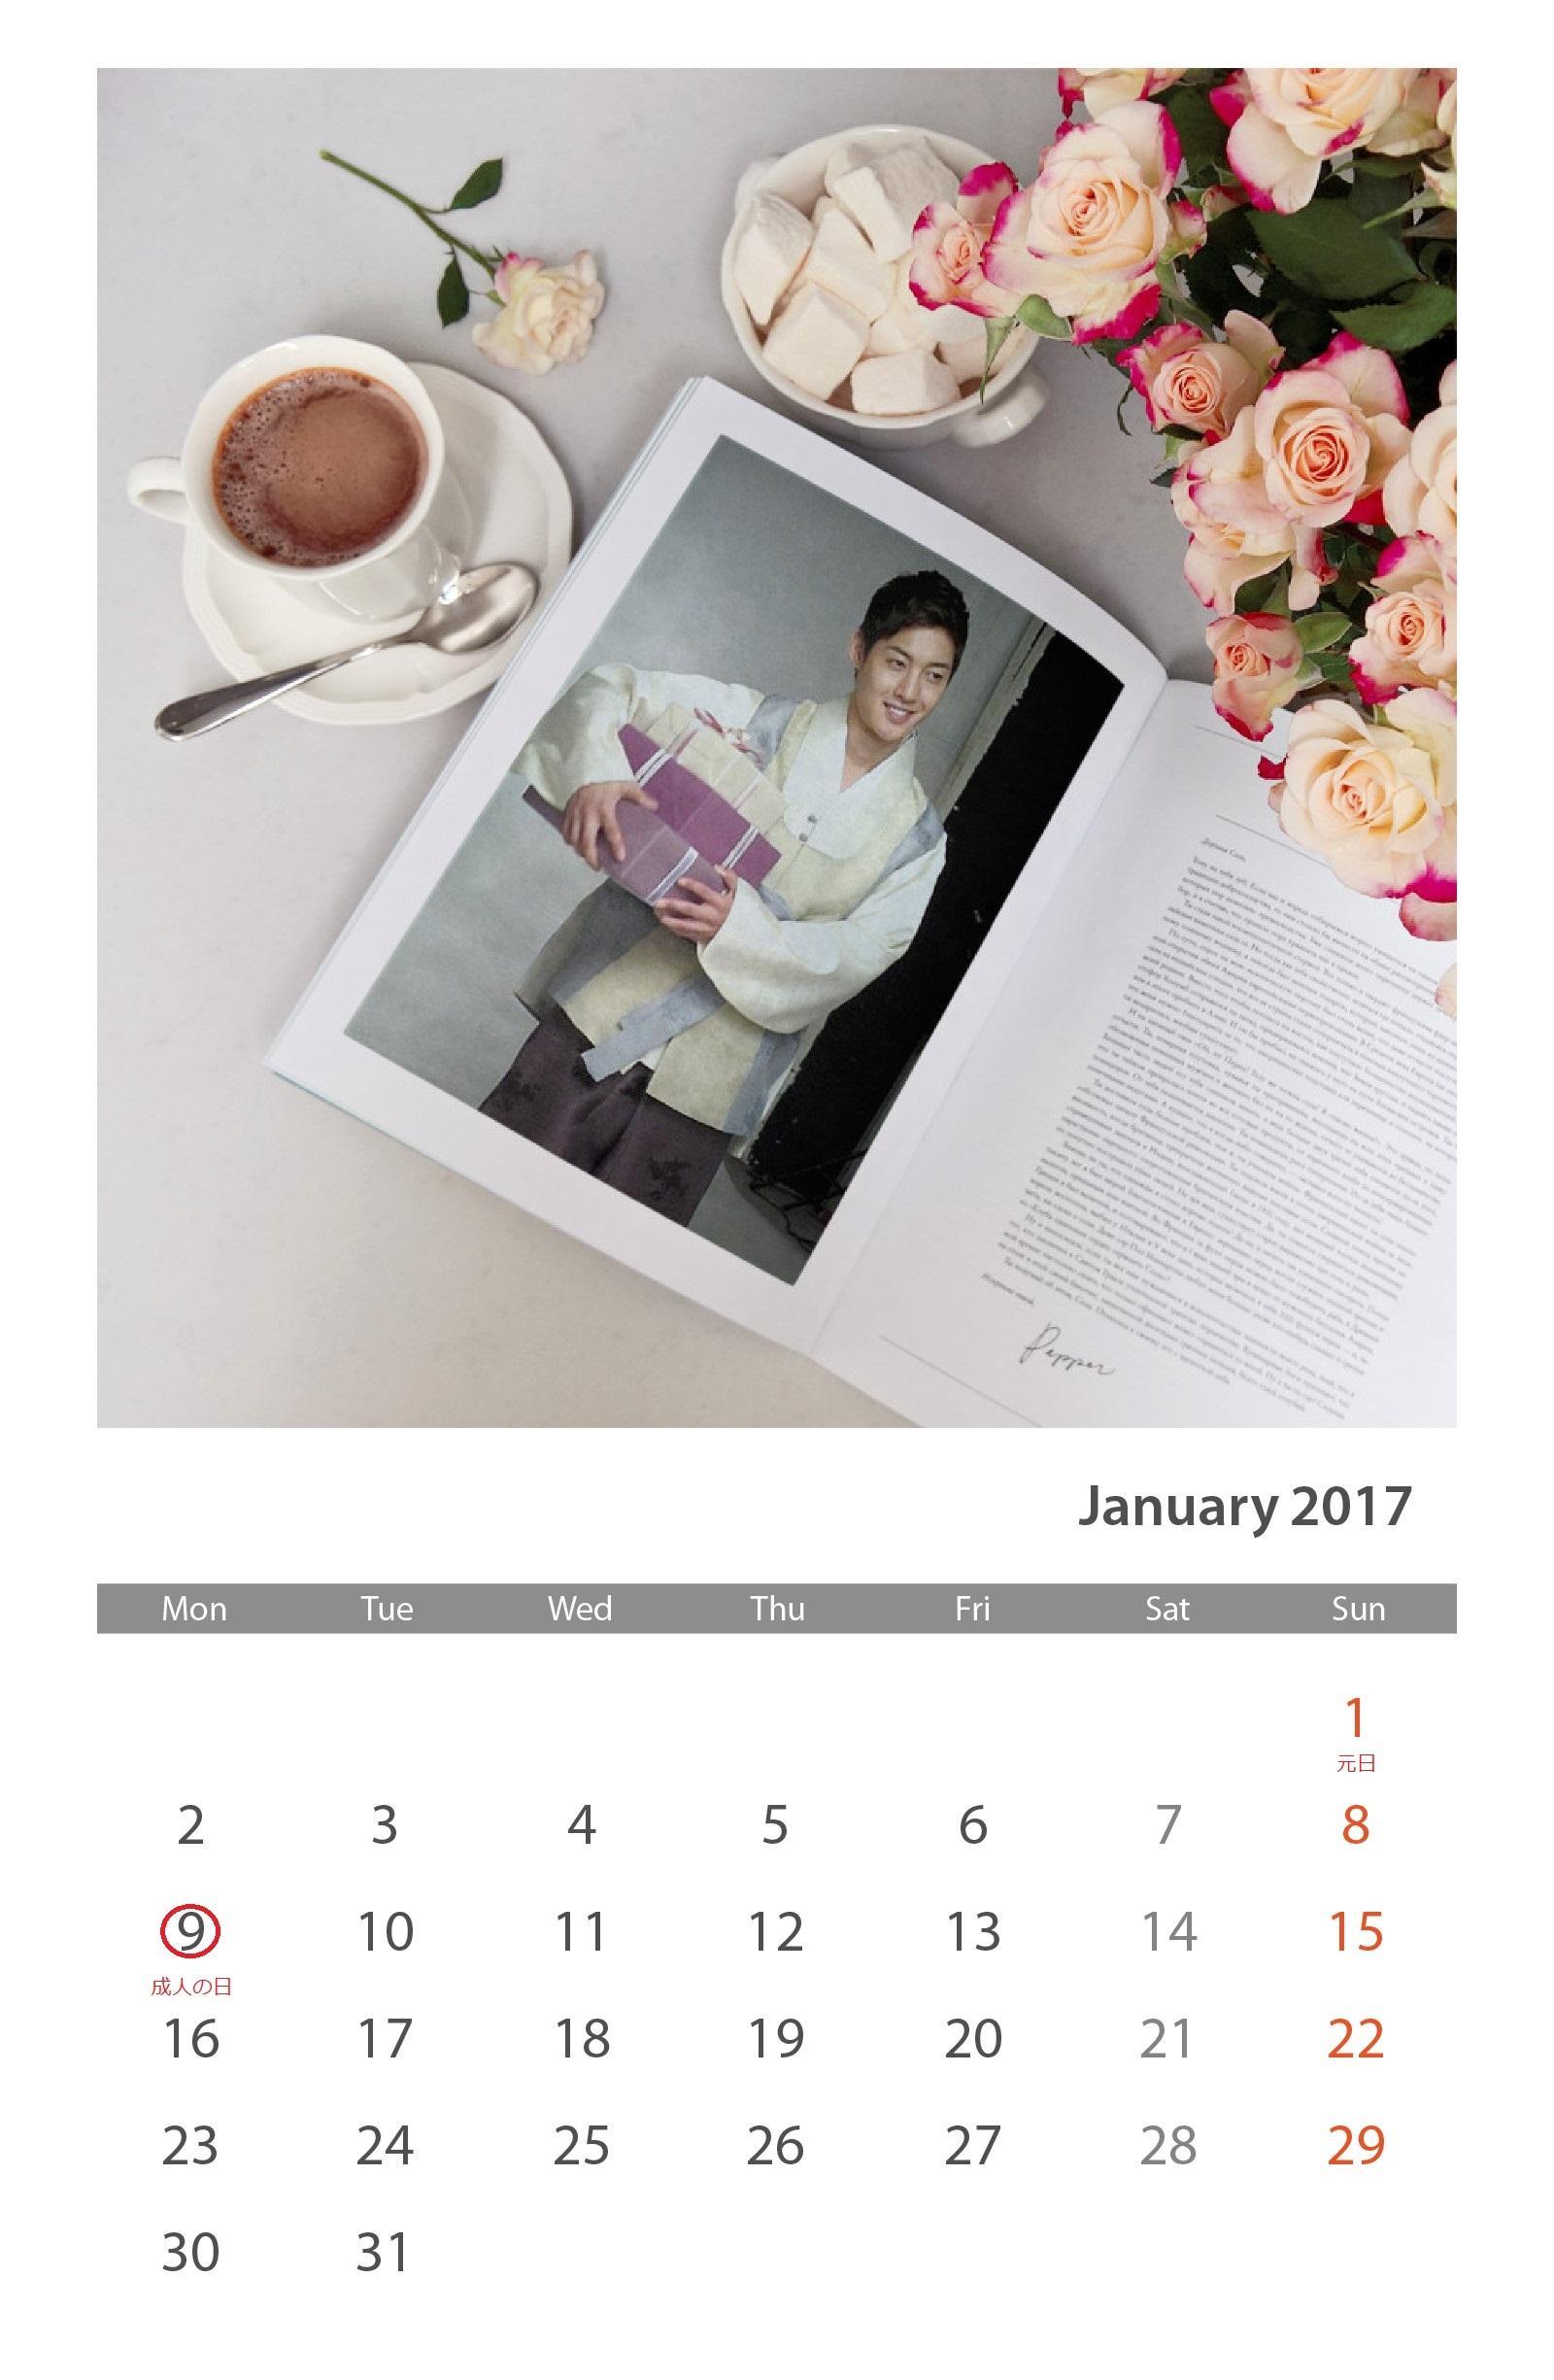 Calendar of January 2017 - 2017.01.01